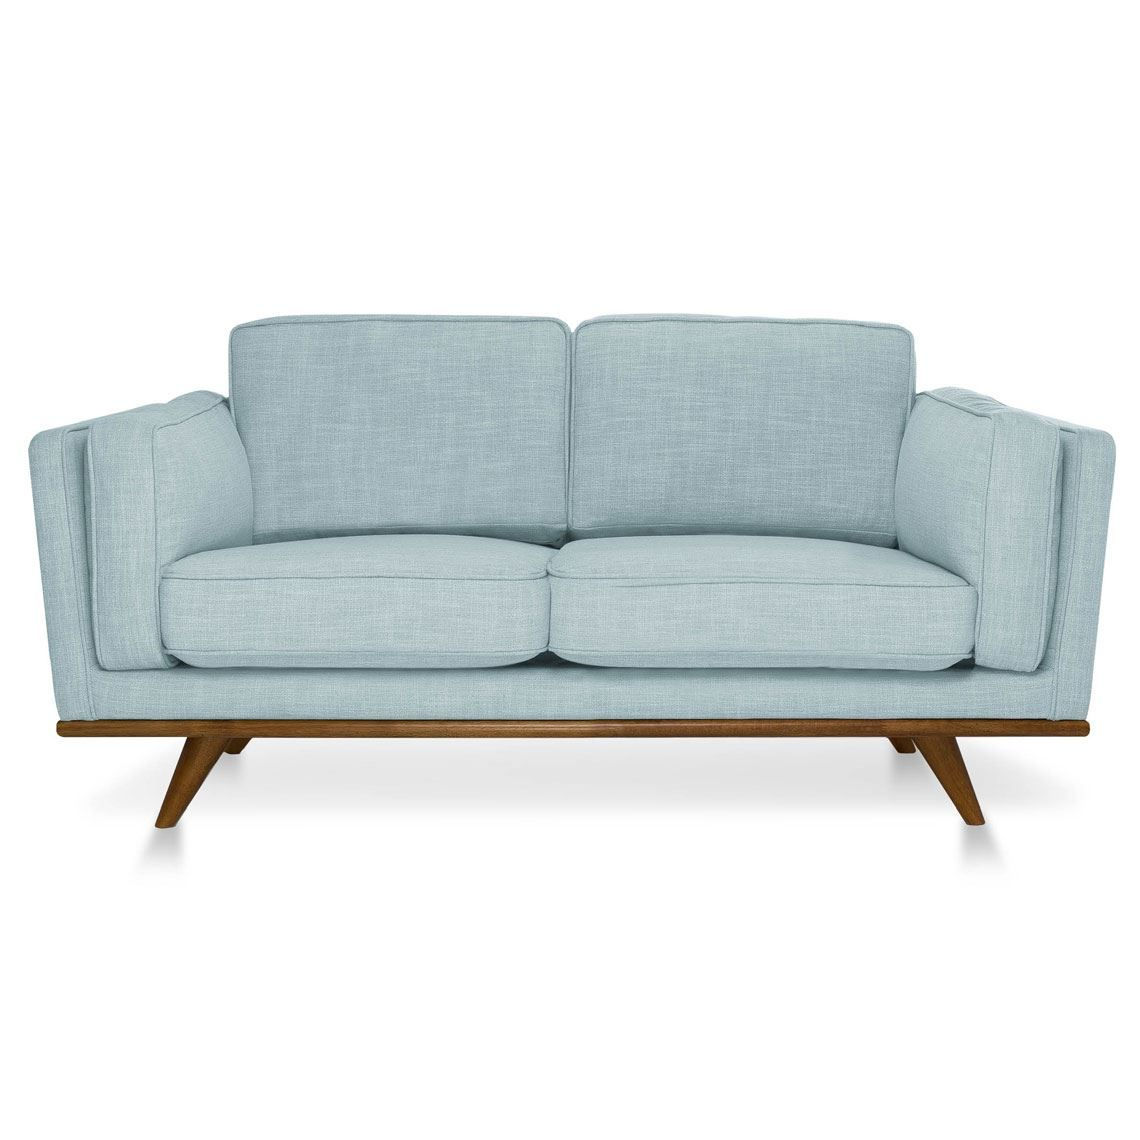 Terrific Dahlia 2 5 Seat Fabric Sofa Skyline In 2019 Products Theyellowbook Wood Chair Design Ideas Theyellowbookinfo